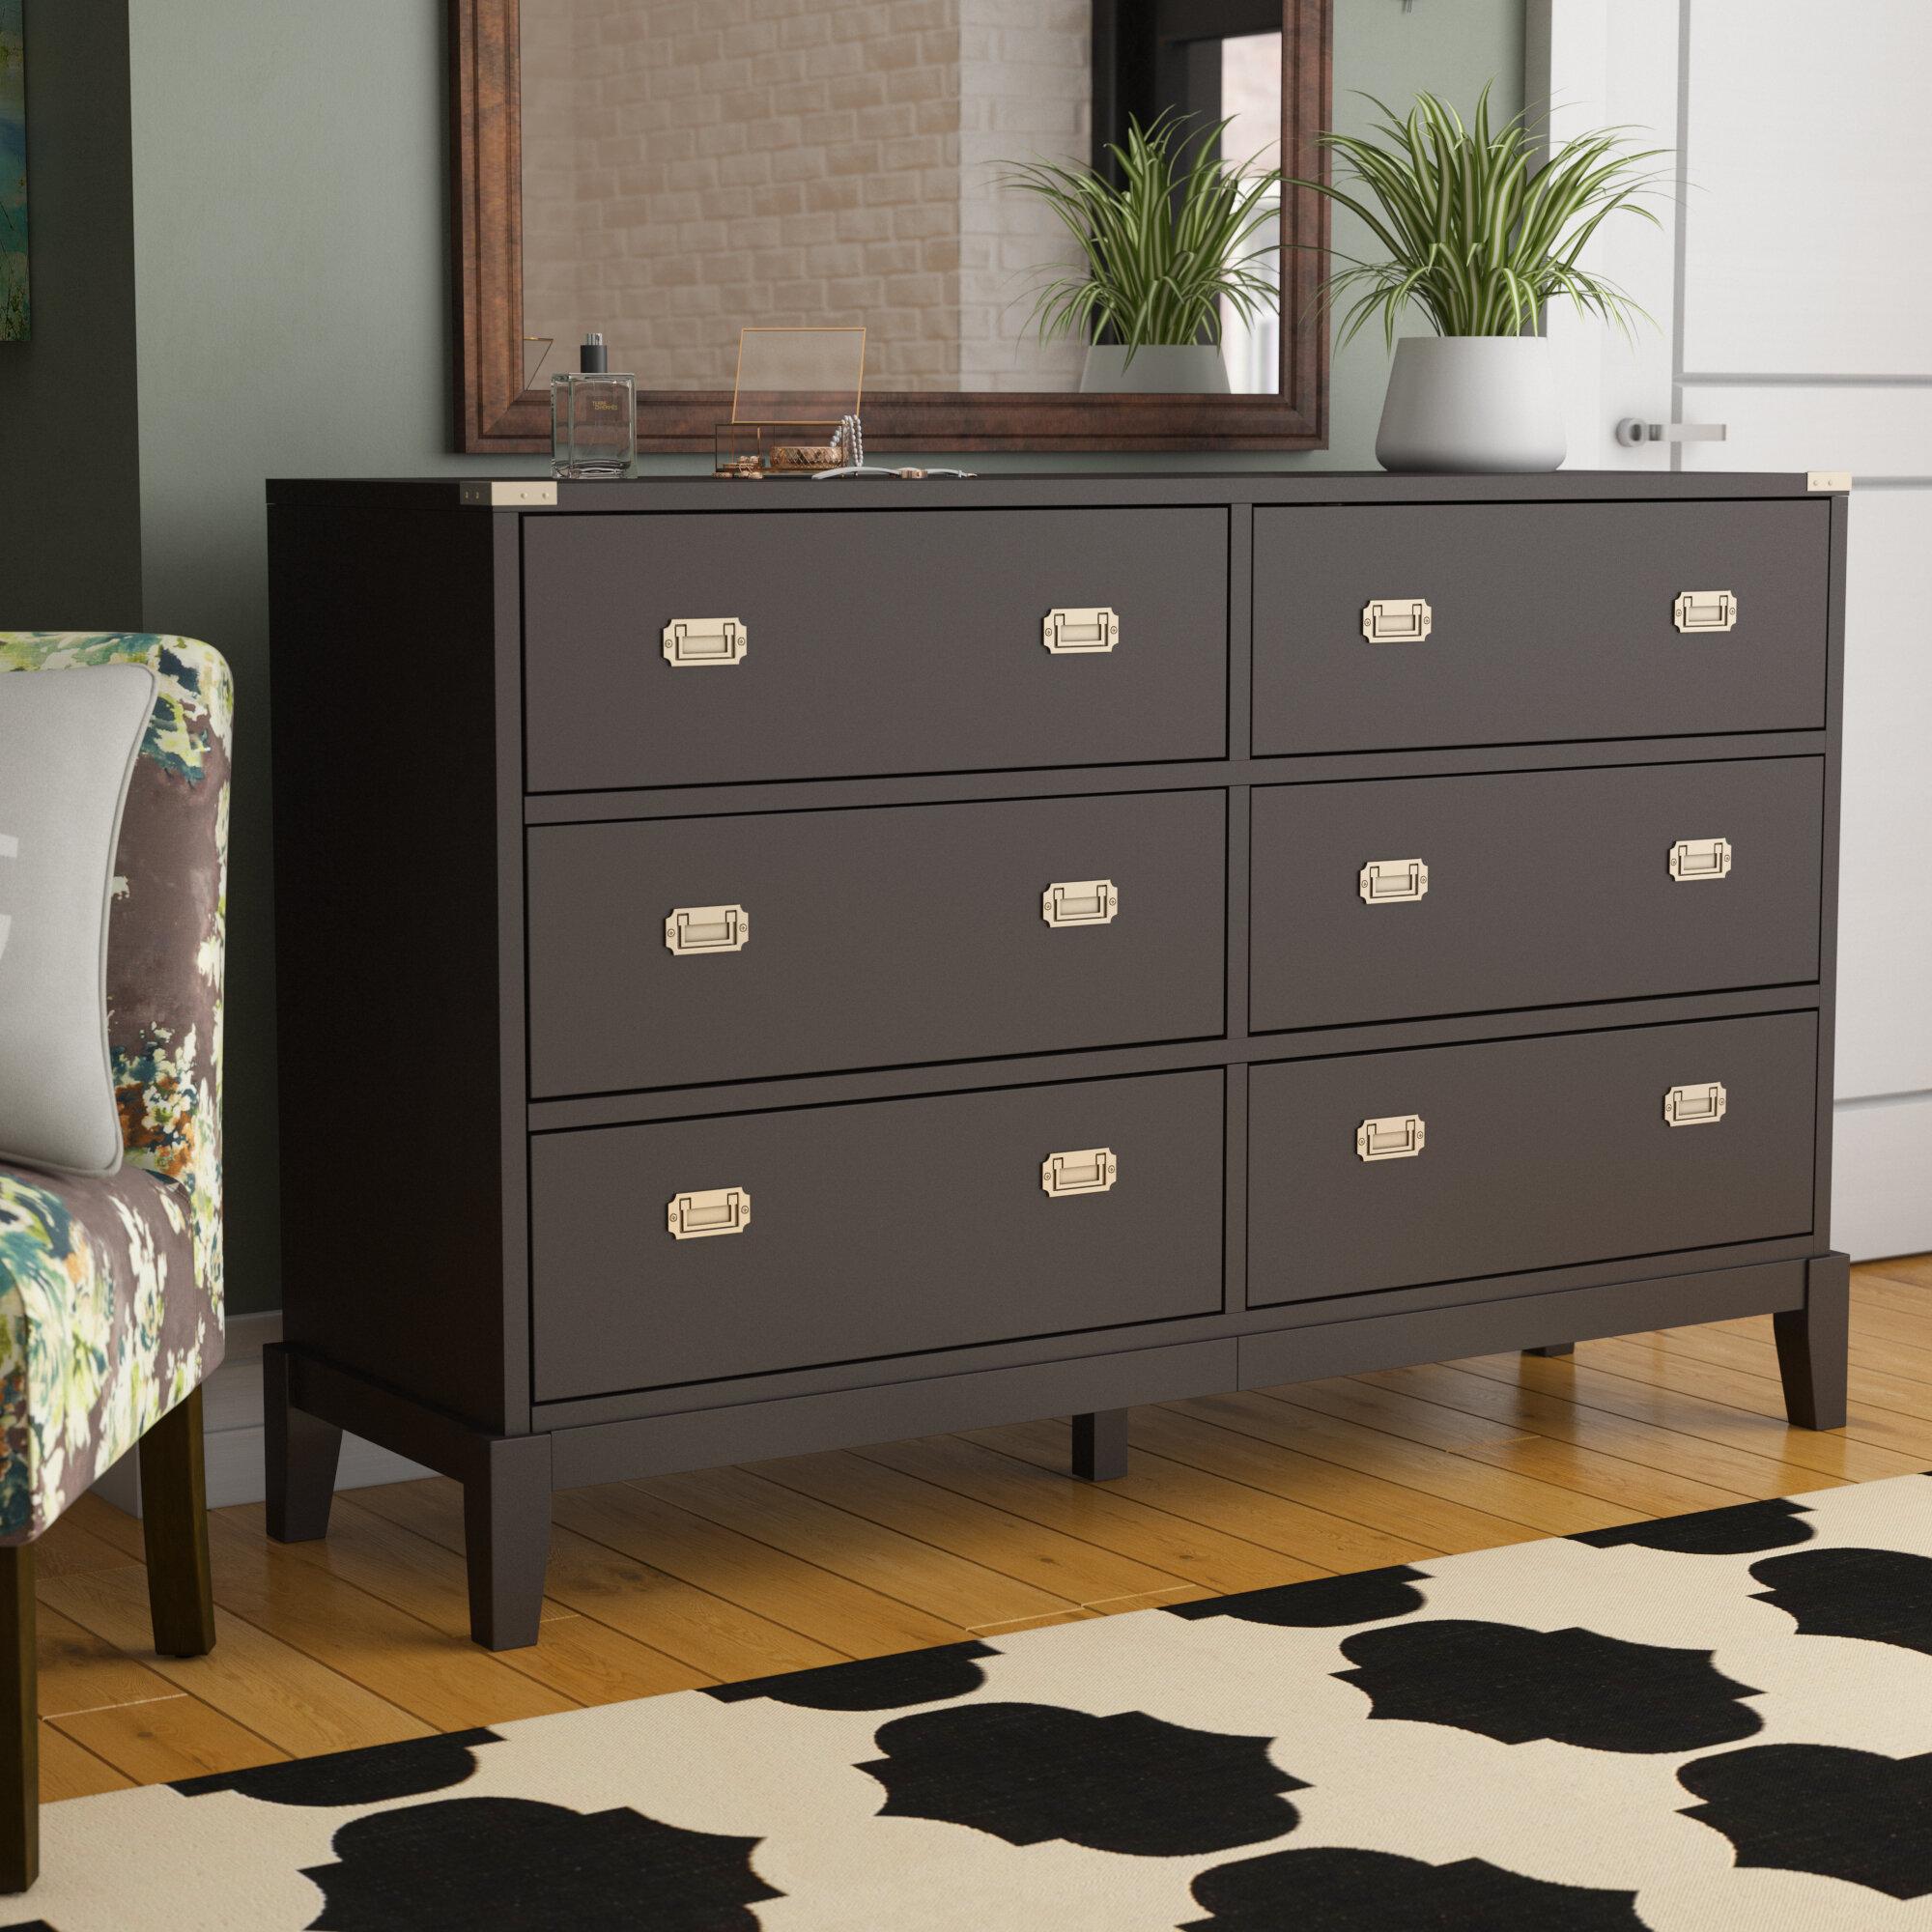 Details About Brayden Studio Rose 6 Drawer Double Dresser